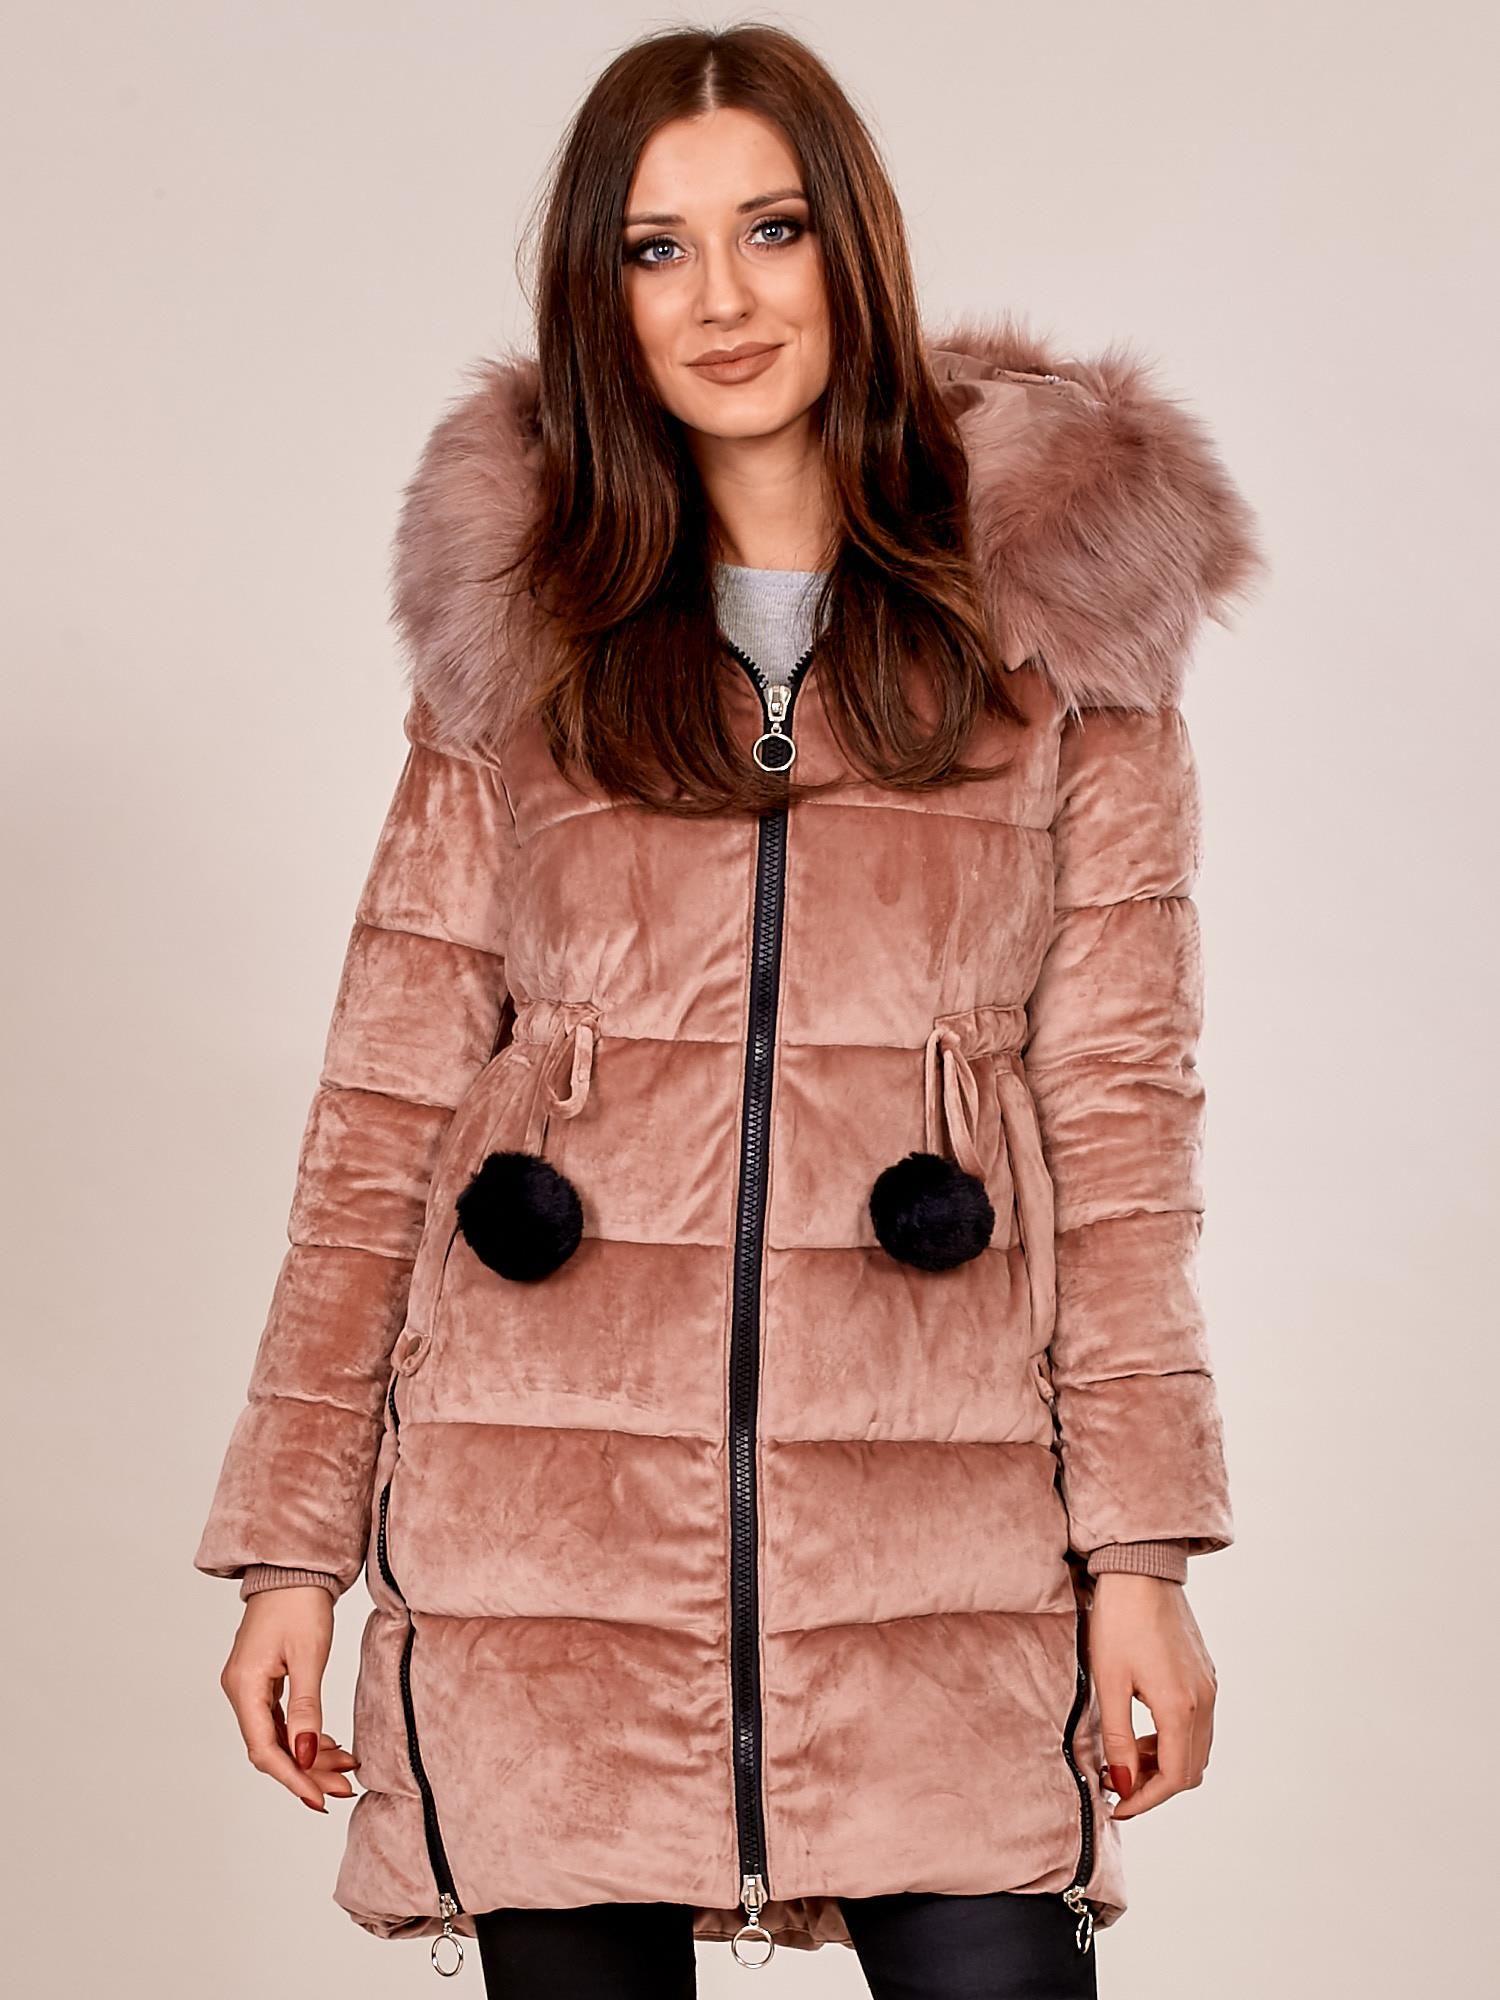 Svetloružová prešívaná zimná bunda s kapucňou - M